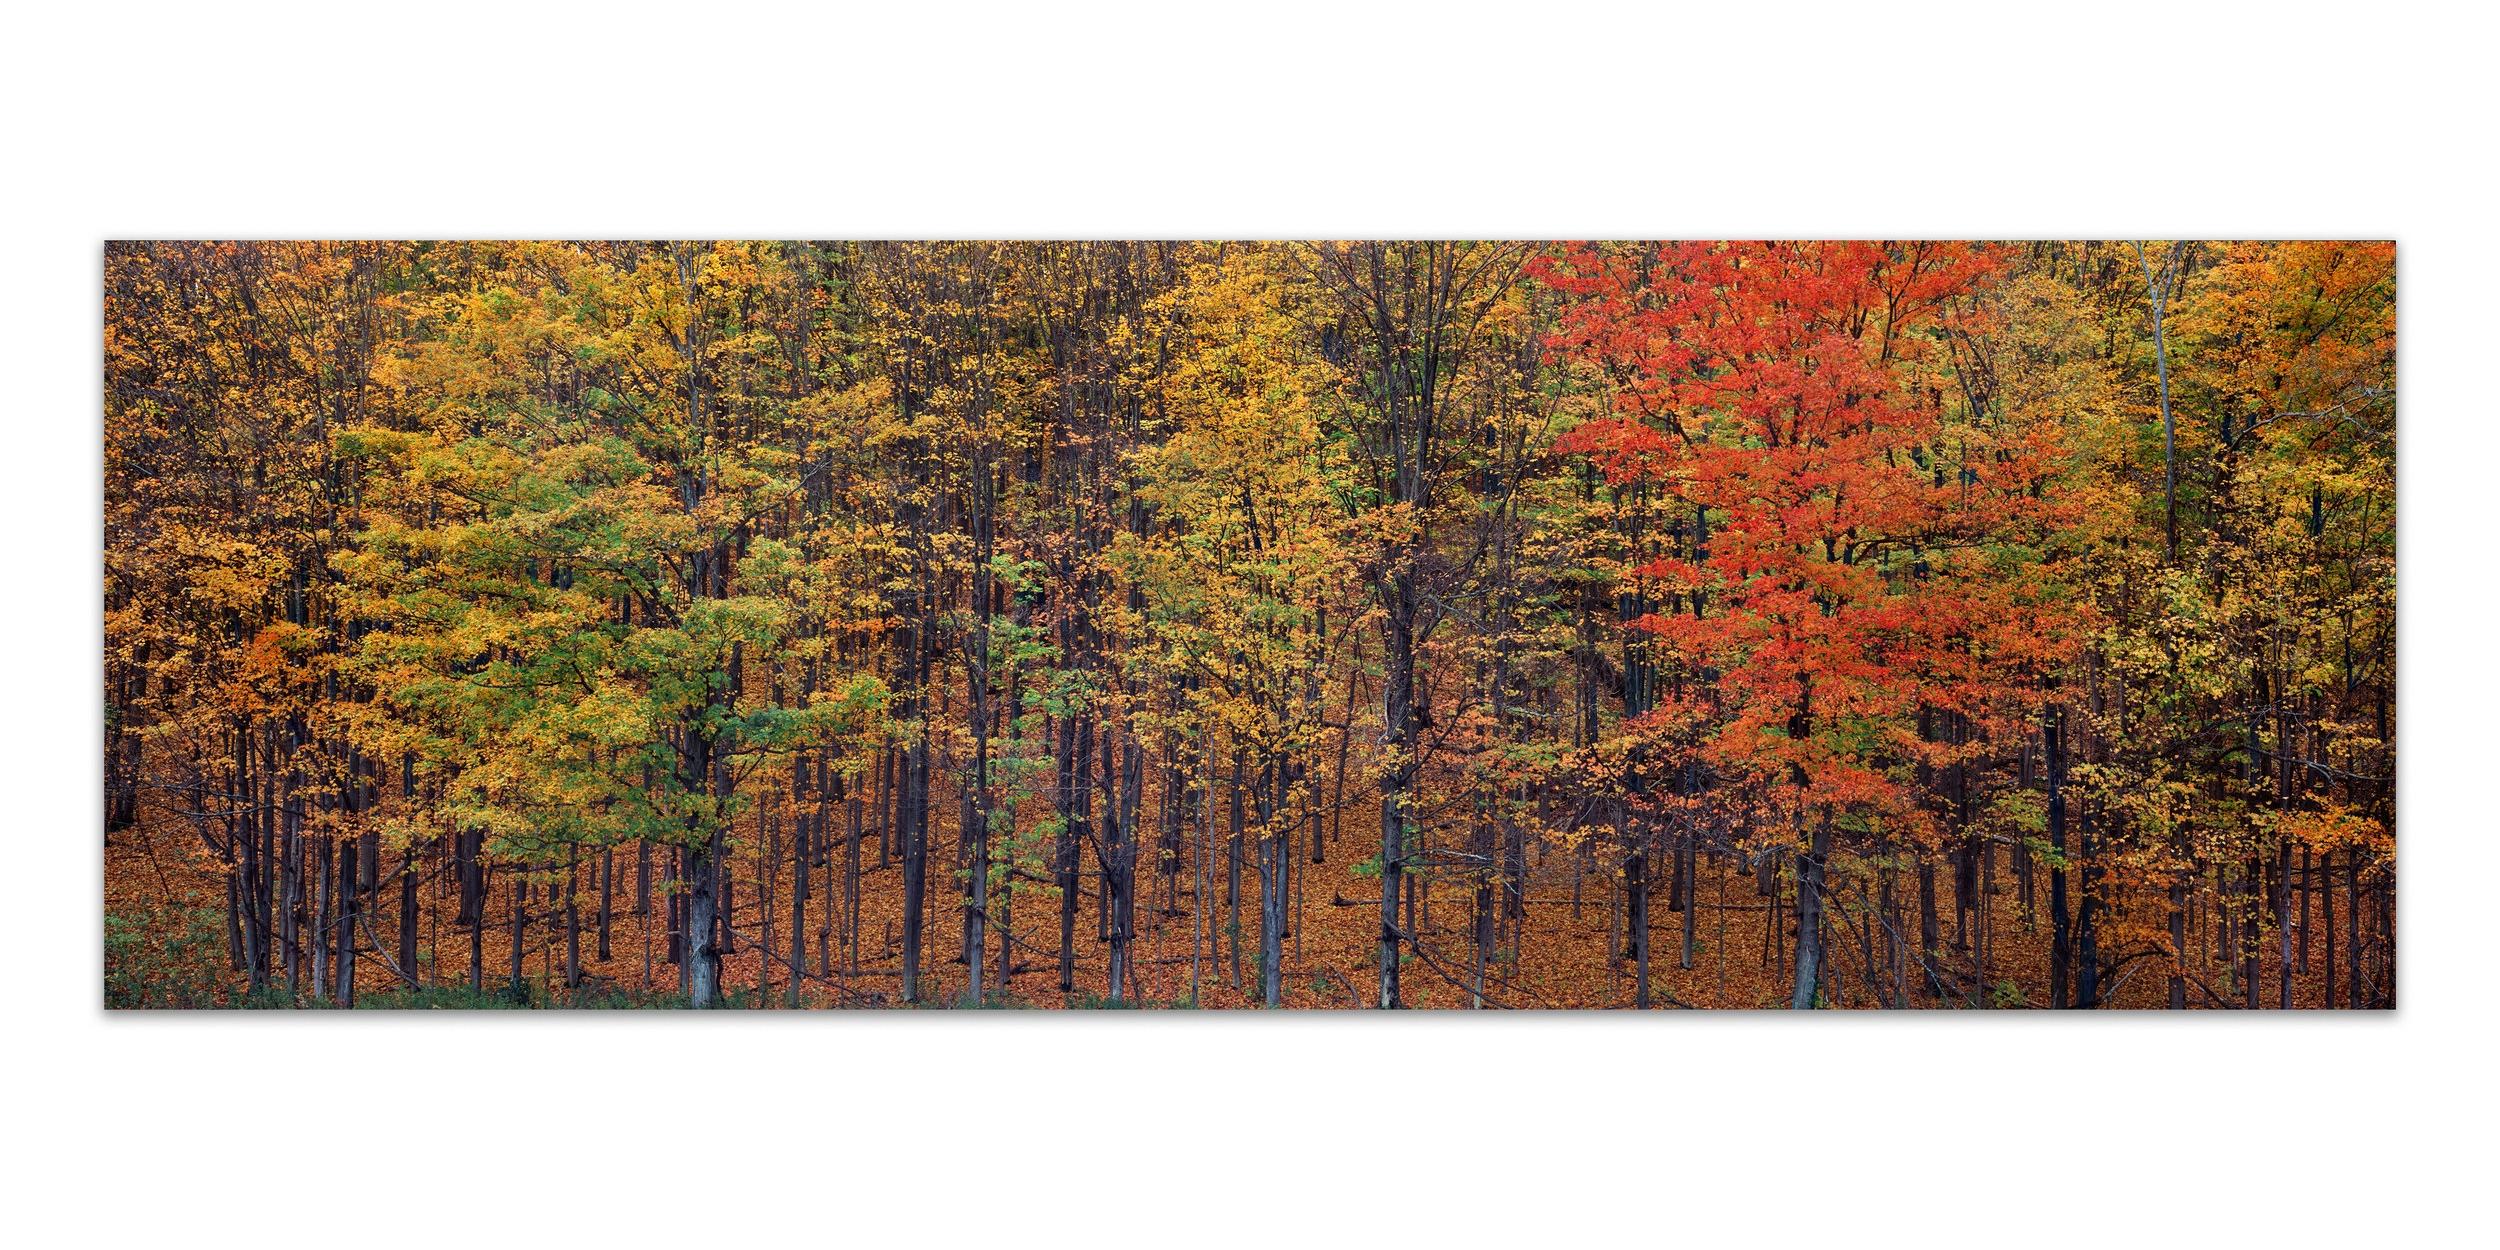 Autumn Whisper Single Image 12%22 Bookjpeg.jpg